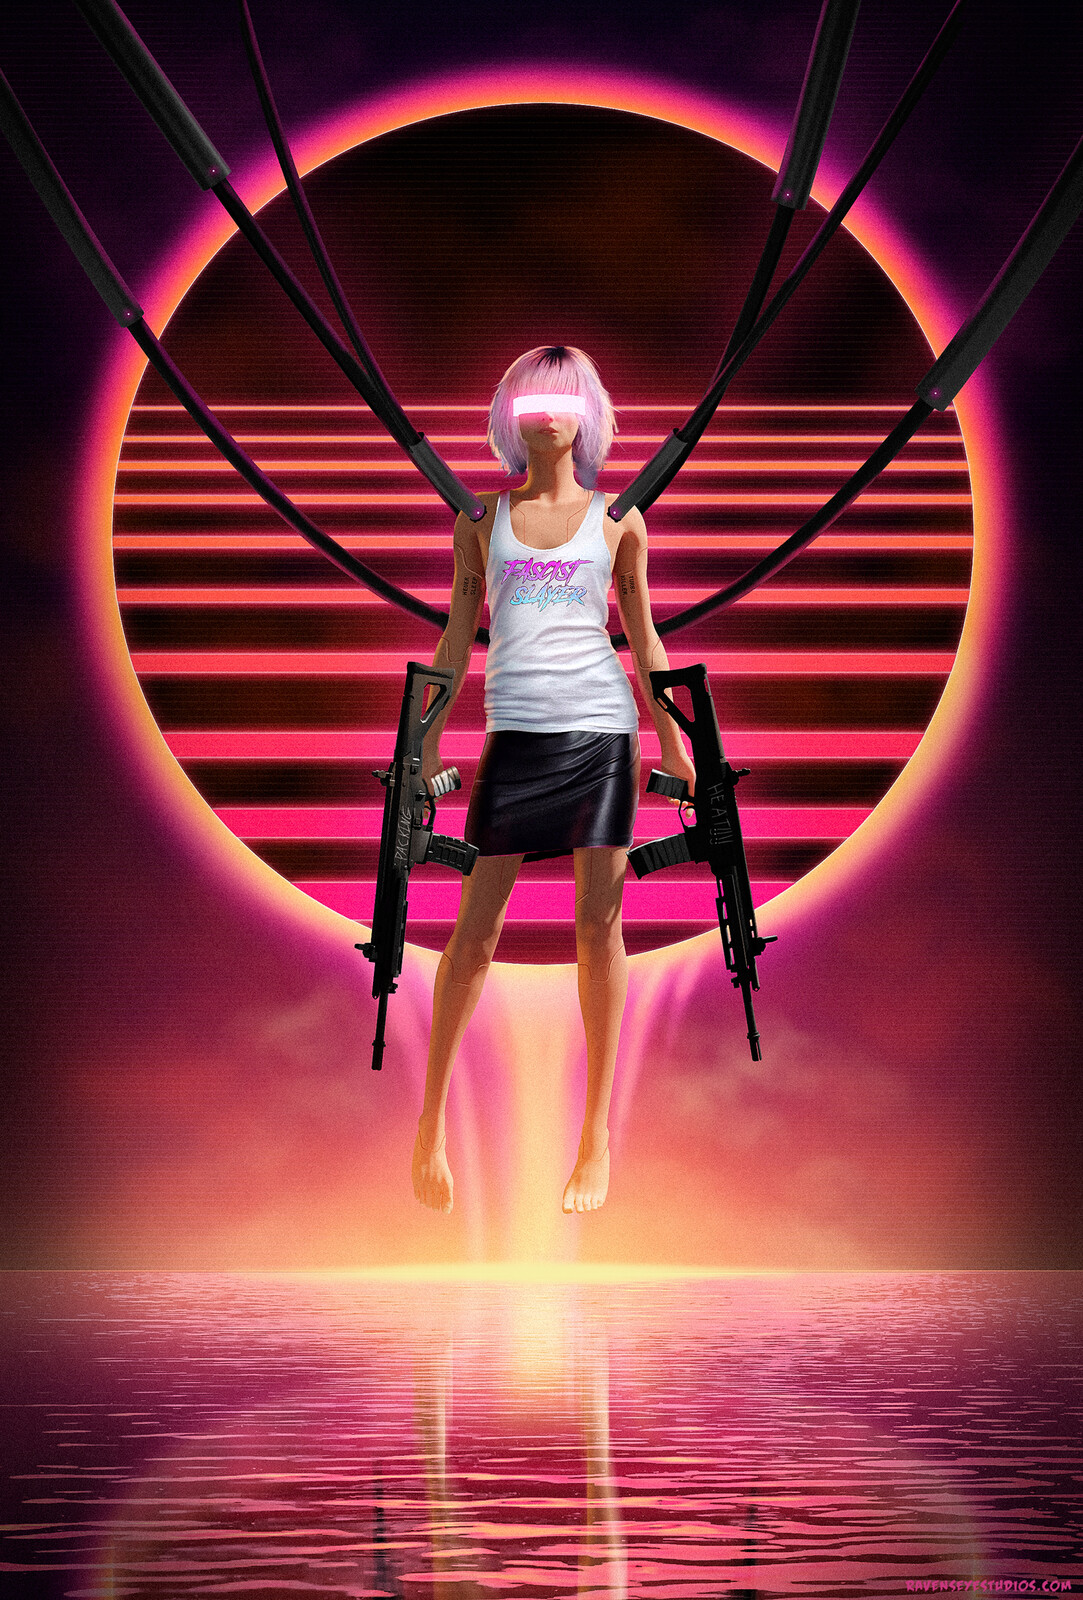 Cyberpunk retro synthwave slayer